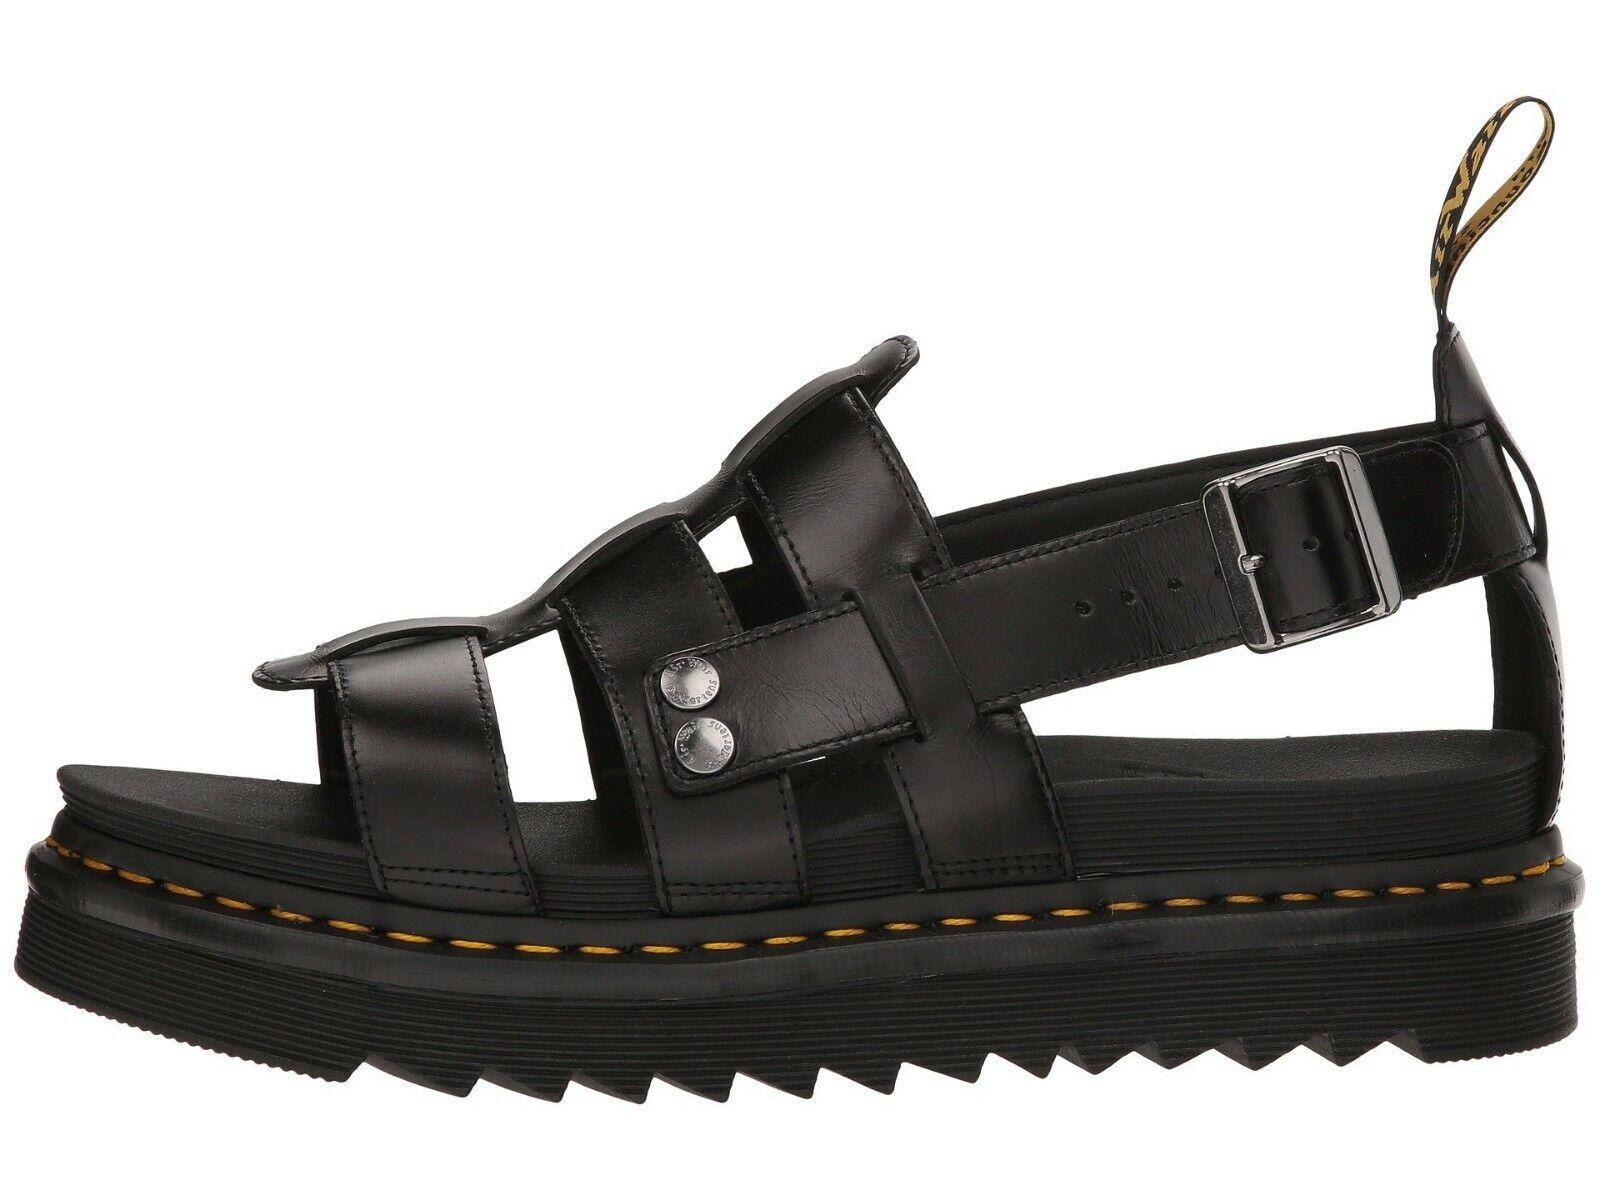 Men's Shoes Dr. Martens TERRY Leather Fisherman Sandals 23521001 BLACK BRANDO 1